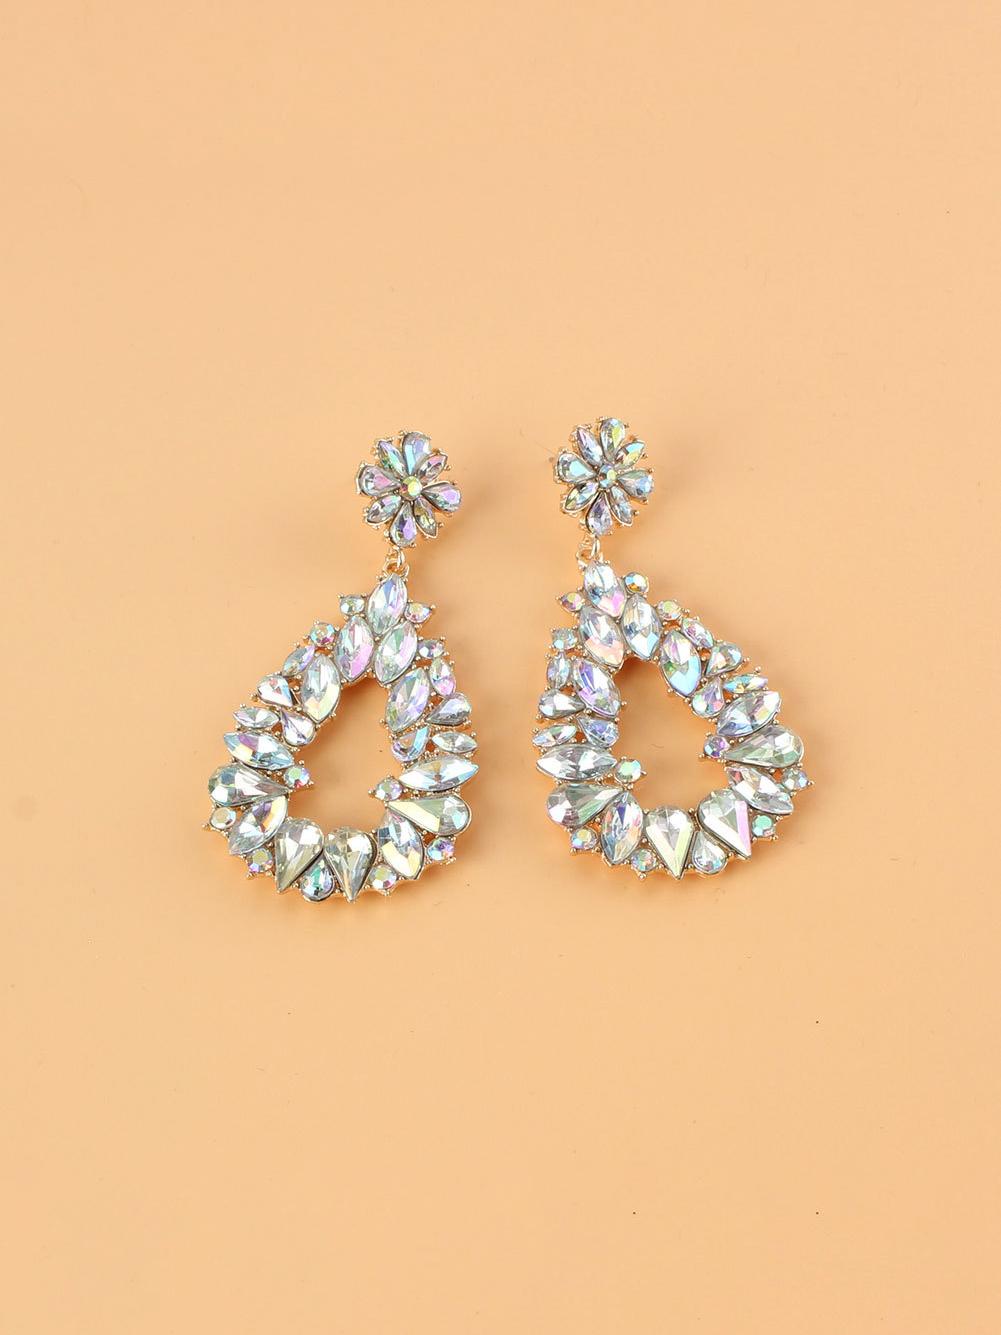 Colourful Rhinestone Business Fashion Women Earrings